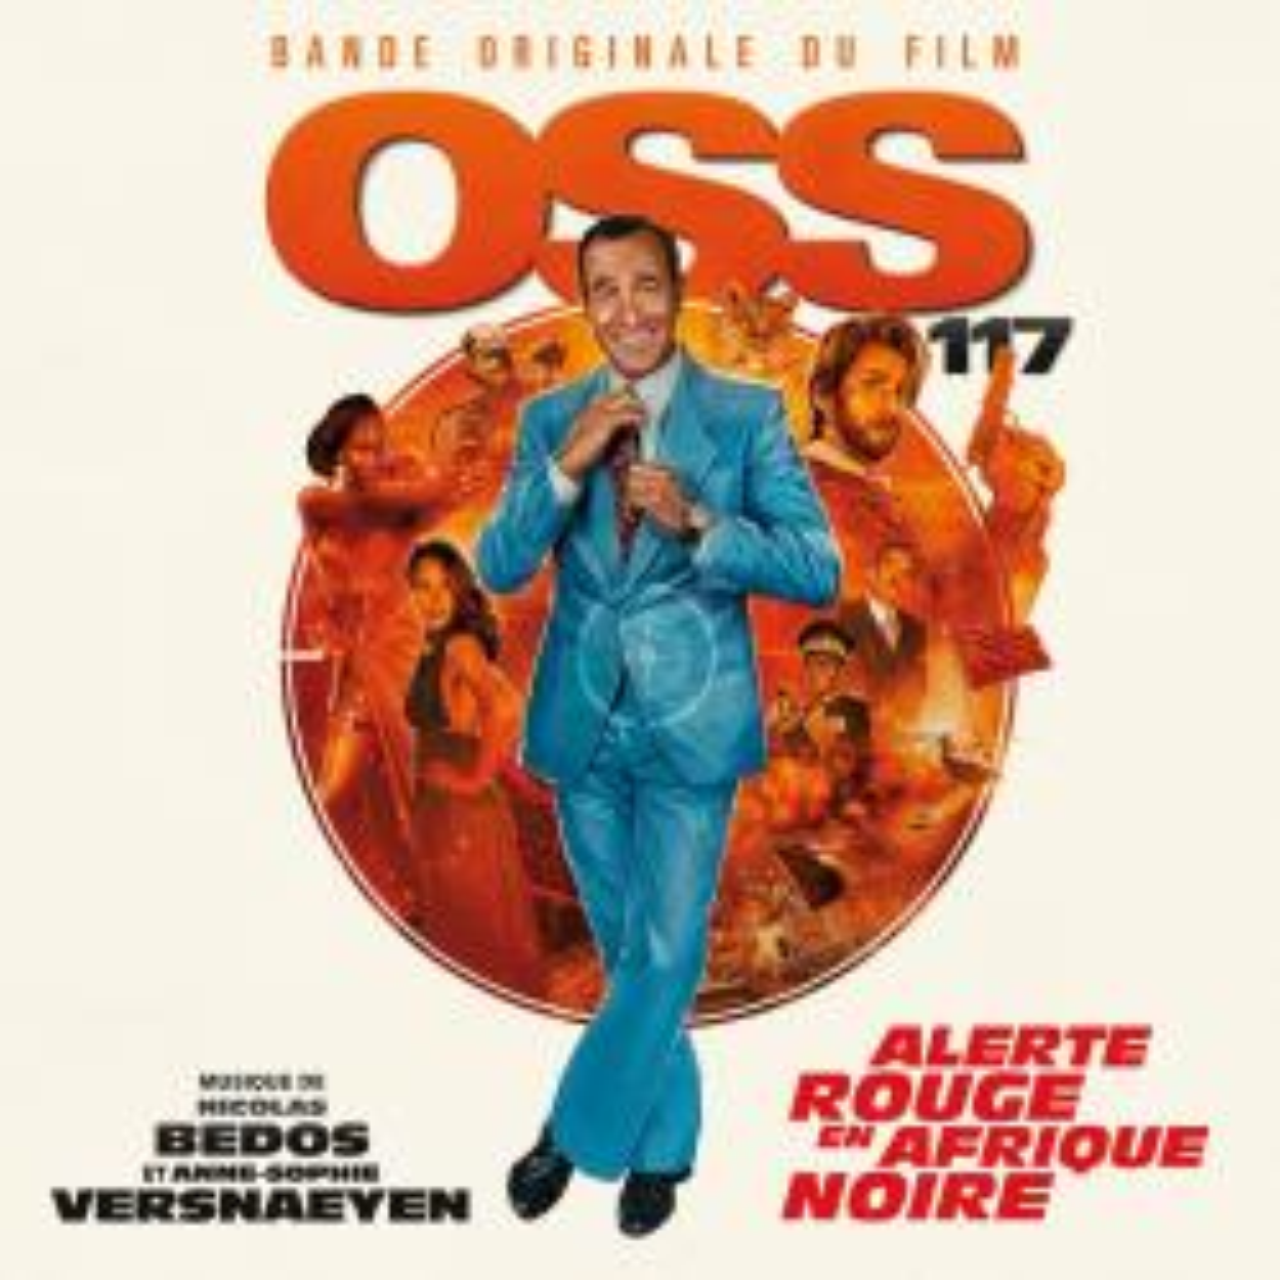 Виниловая пластинка Nicolas Bedos /Anne-Sophie Versnaeyen - OSS 117: Alerte rouge en Afrique noire (Black Vinyl)